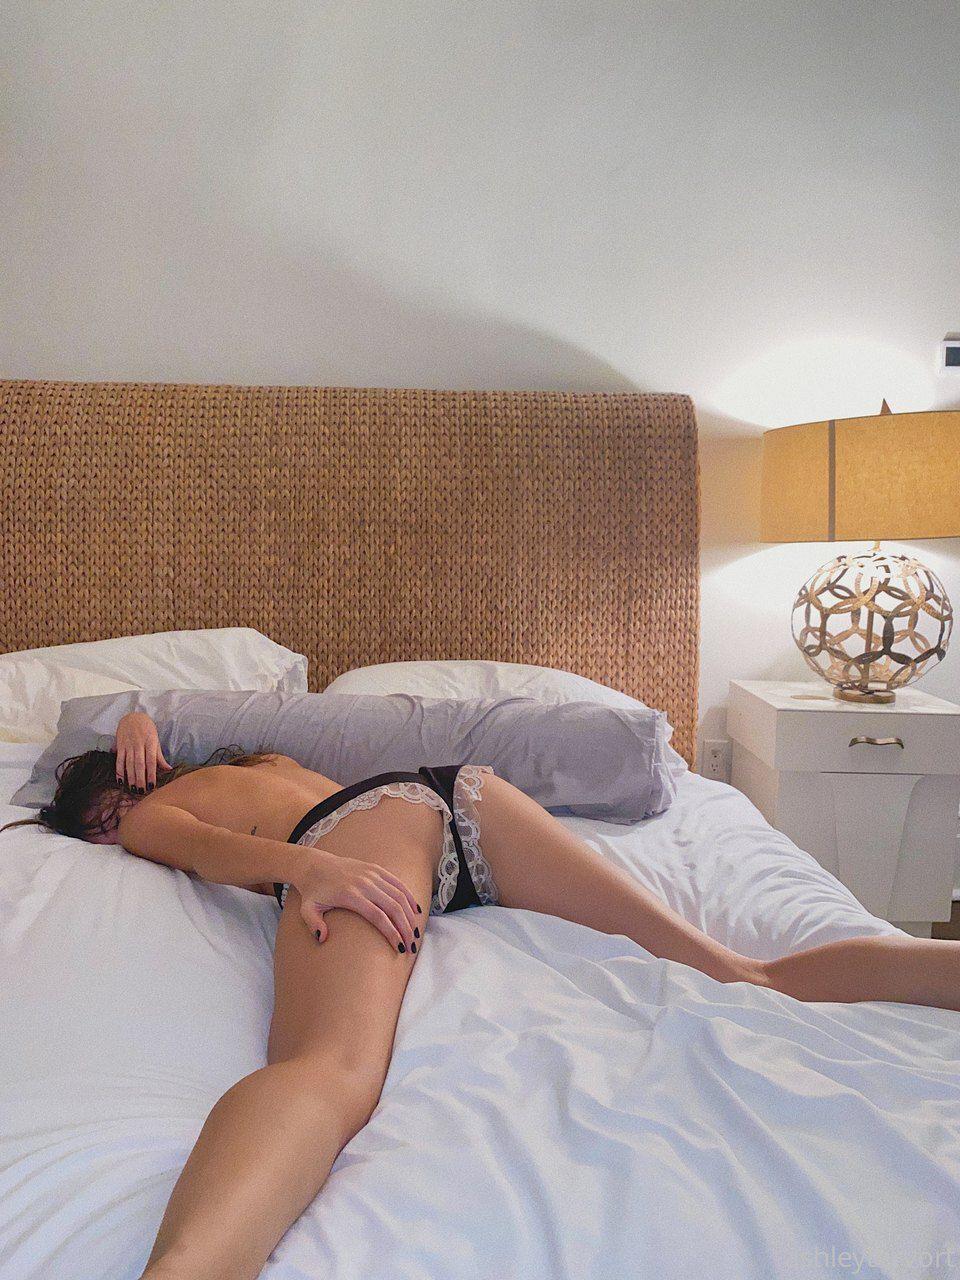 Ashley Tervort Topless On Bed